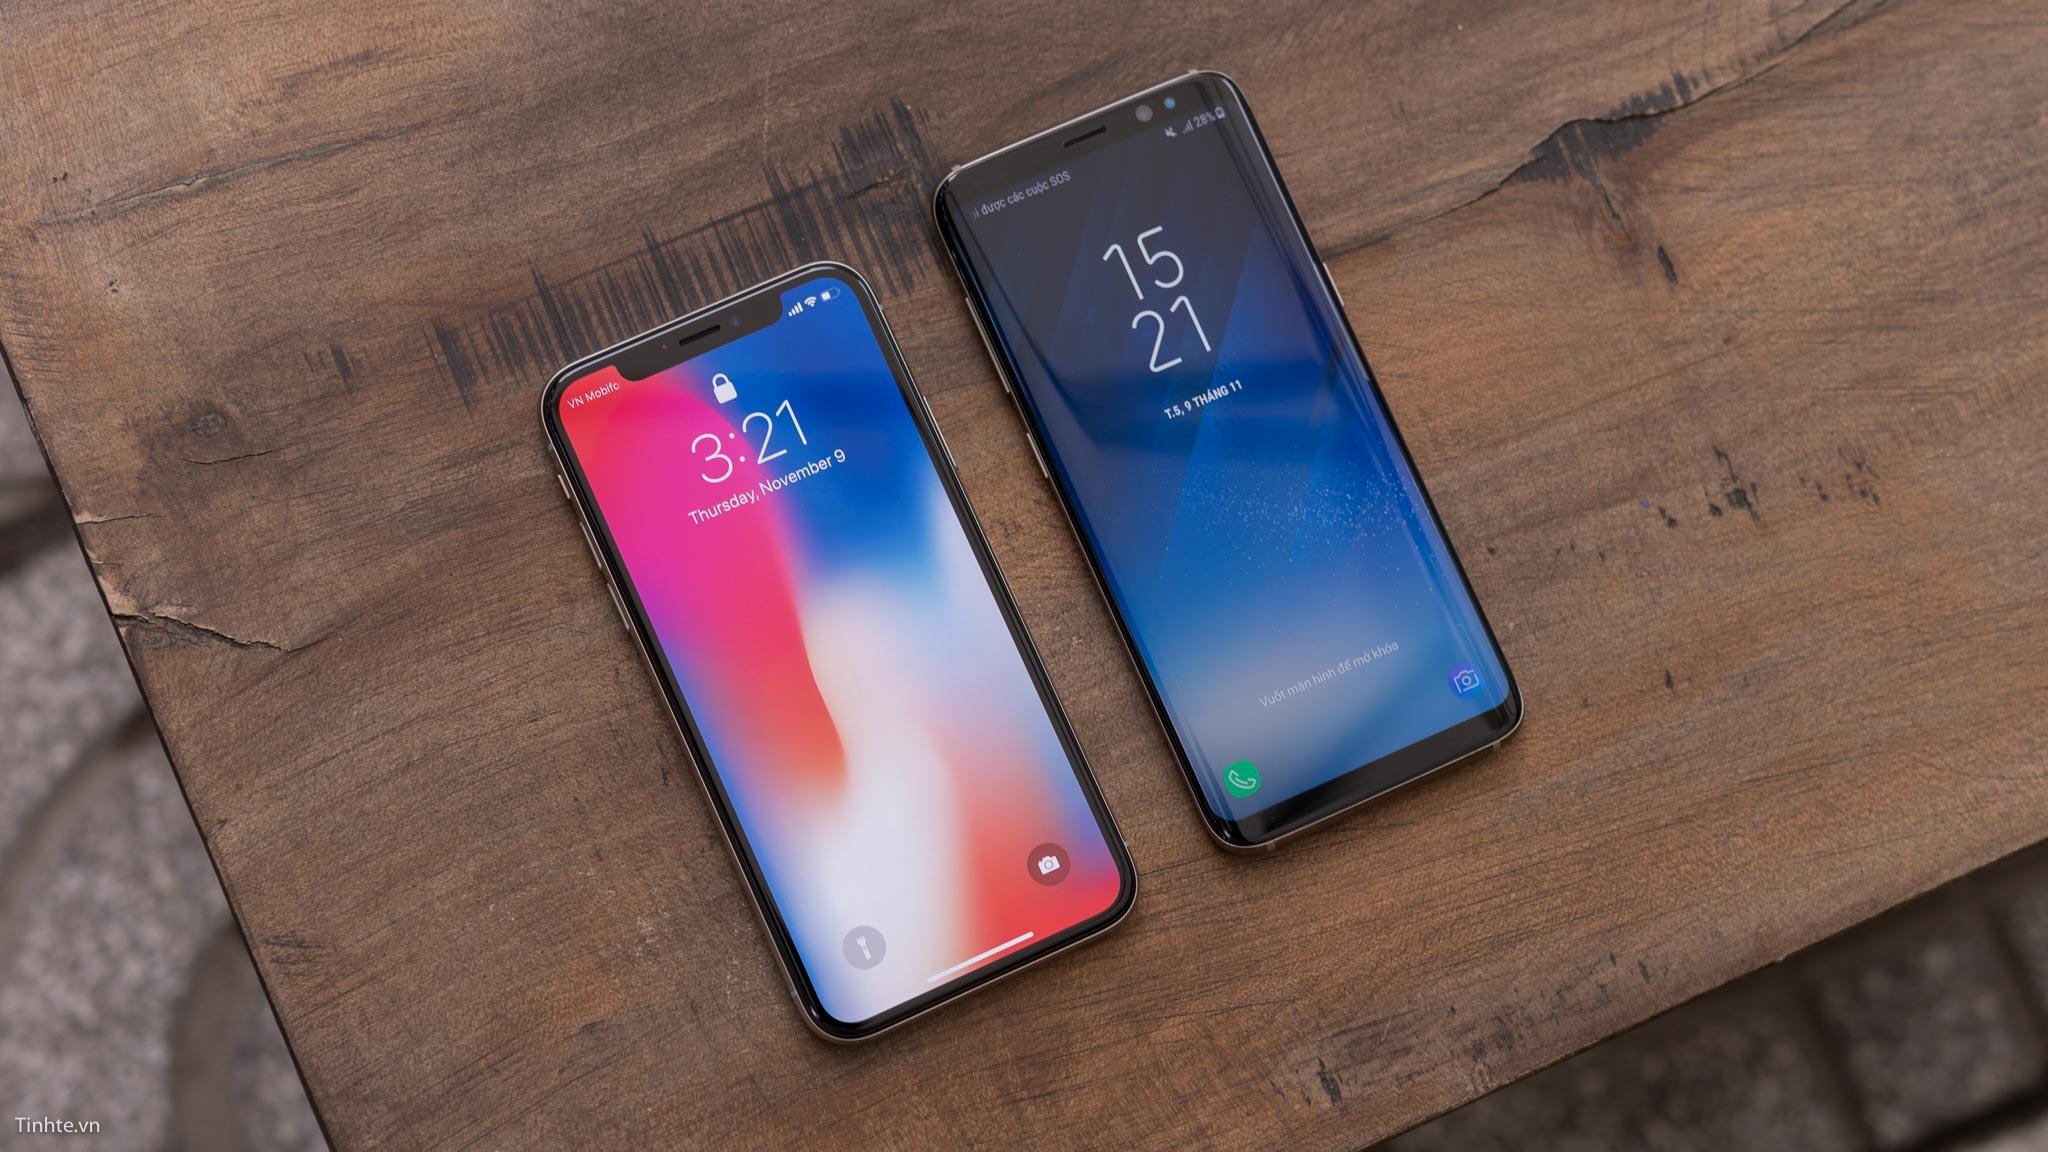 iphonex-s8-tinhte-3.jpg